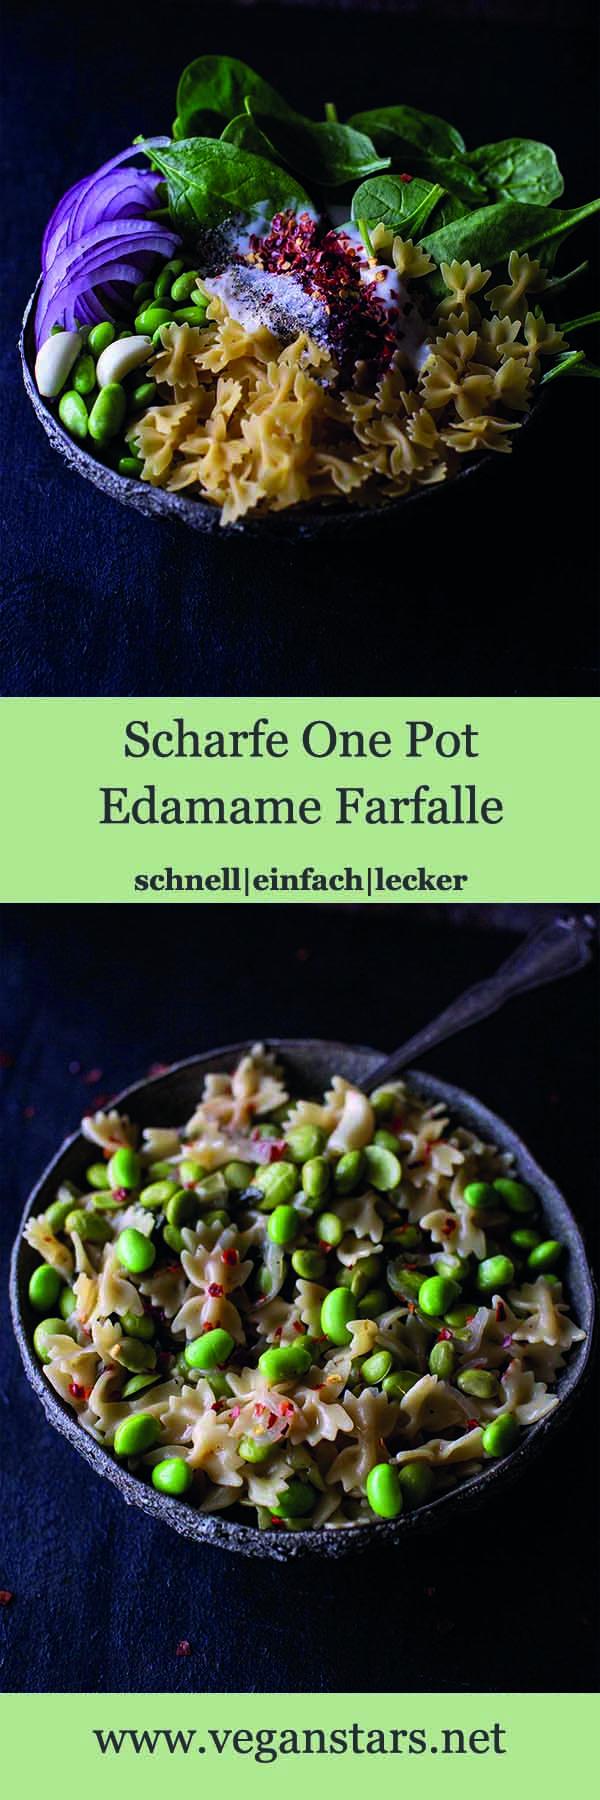 Scharfe One Pot Edamame Farfalle